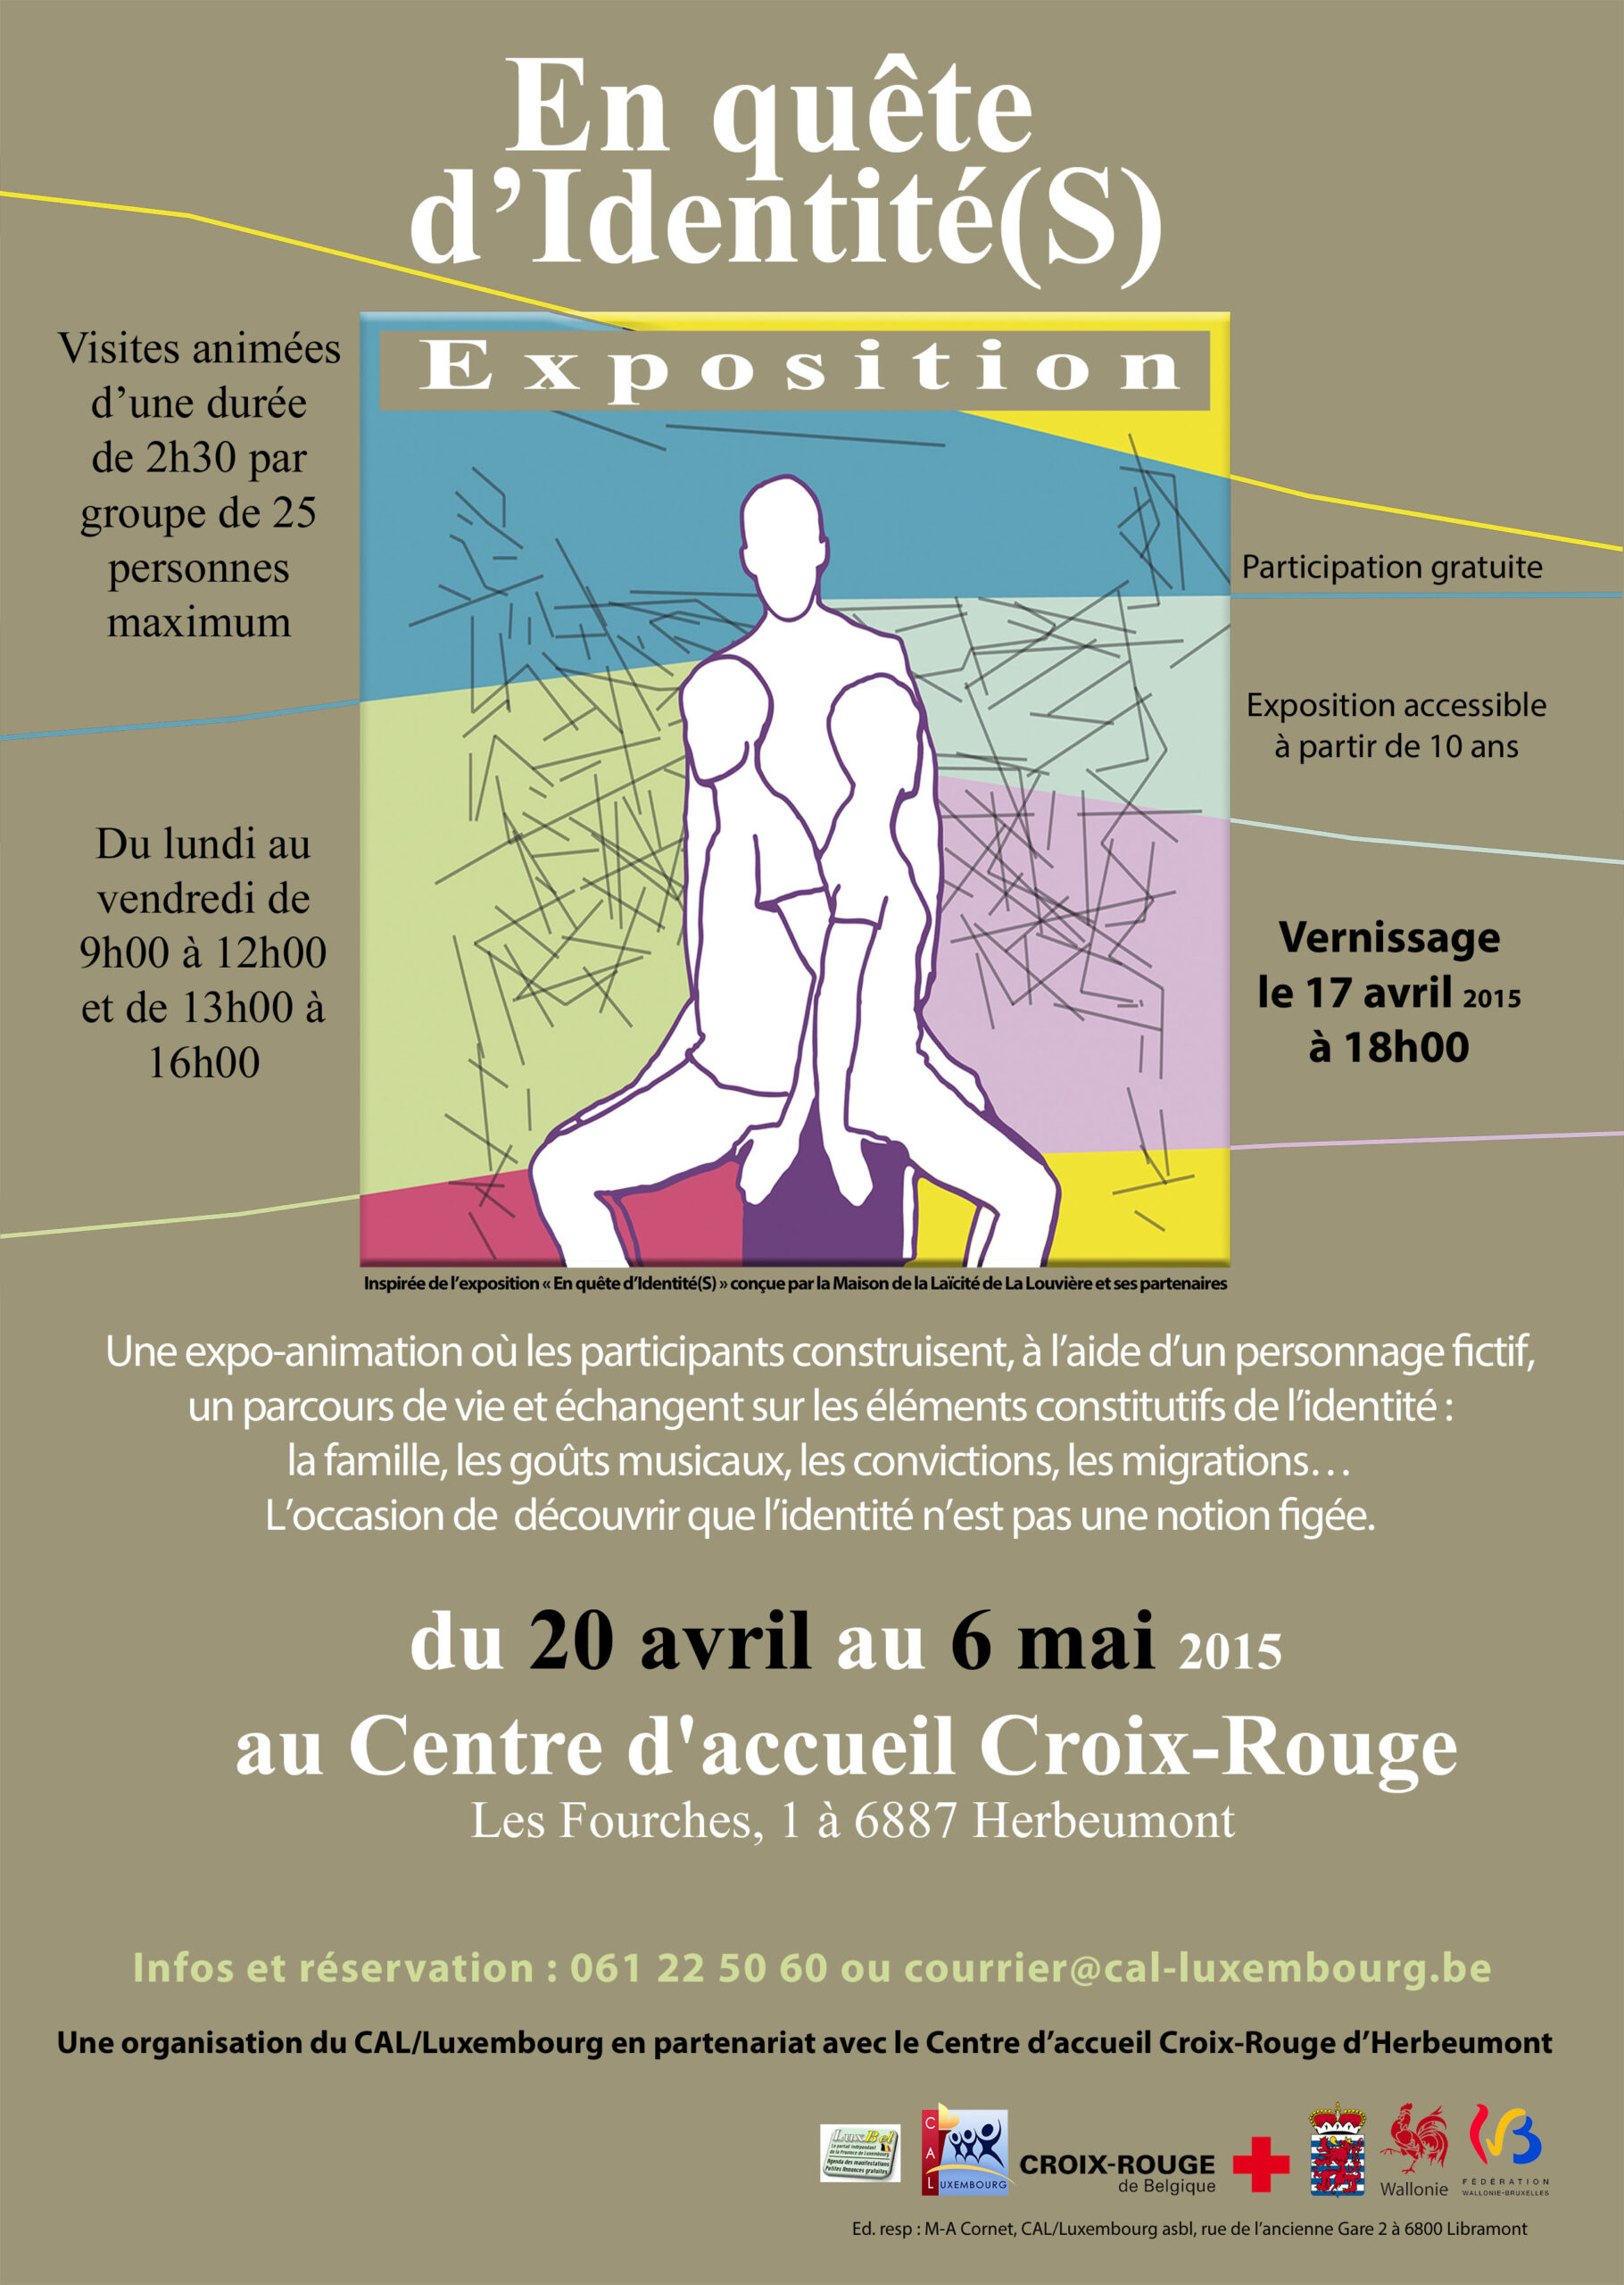 Expo-animation à Herbeumont